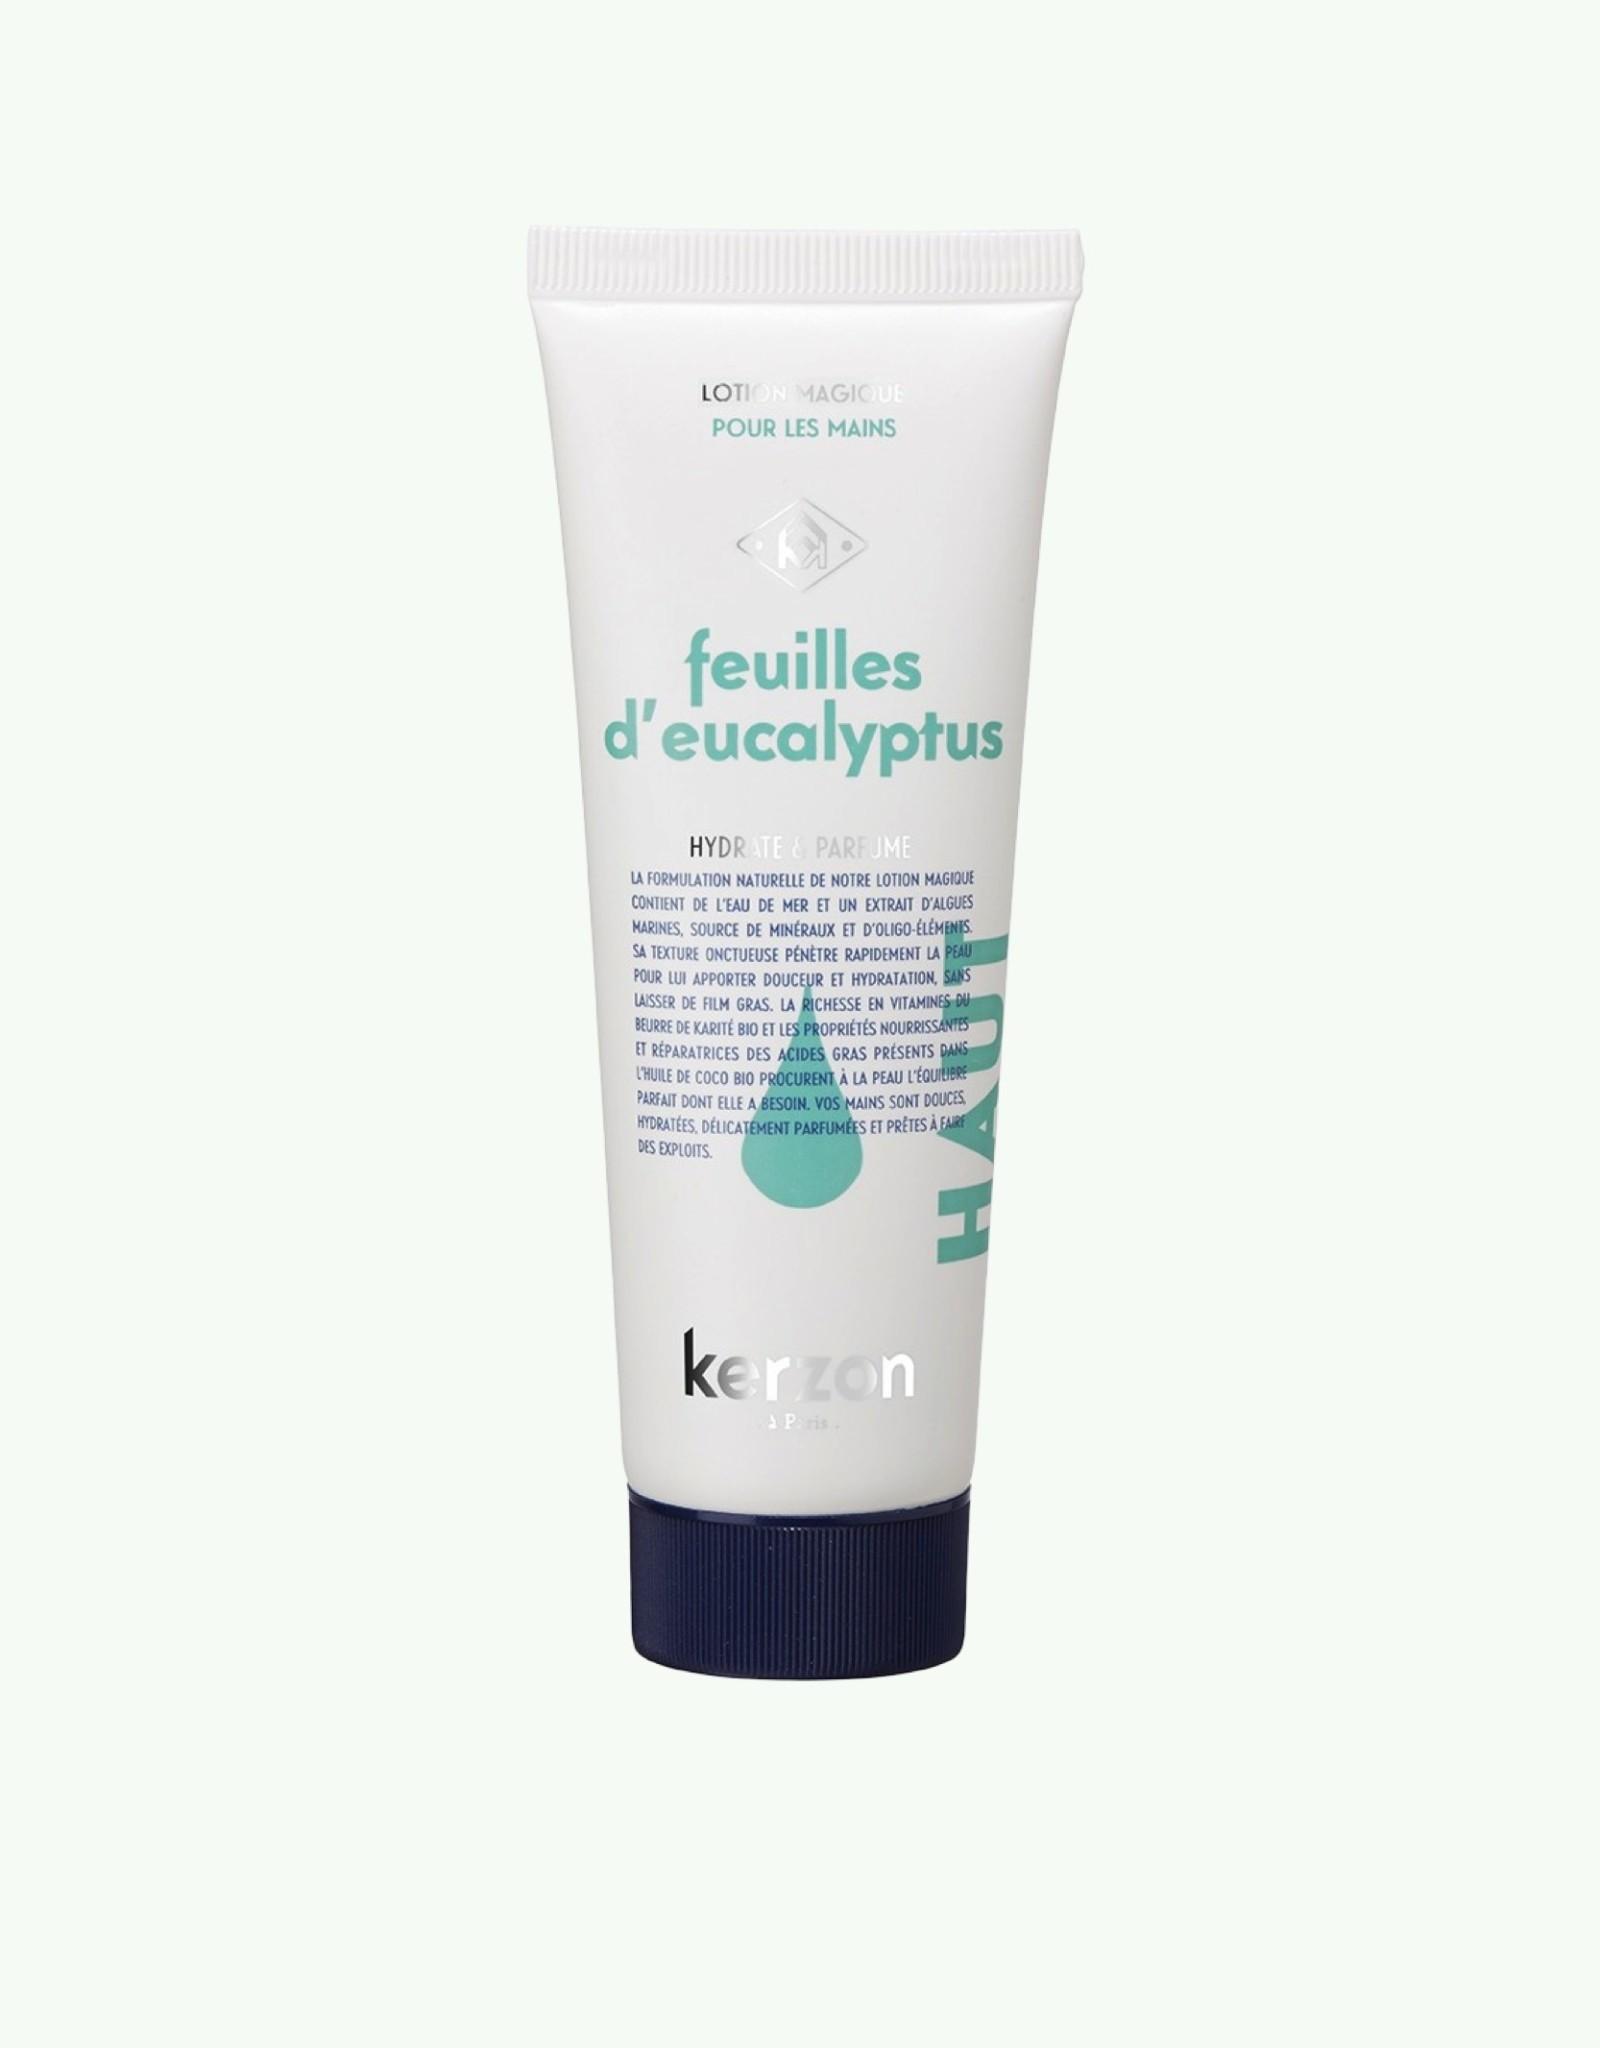 Kerzon Kerzon - Feuille d'Eucalyptus - Handcreme - 75 ml